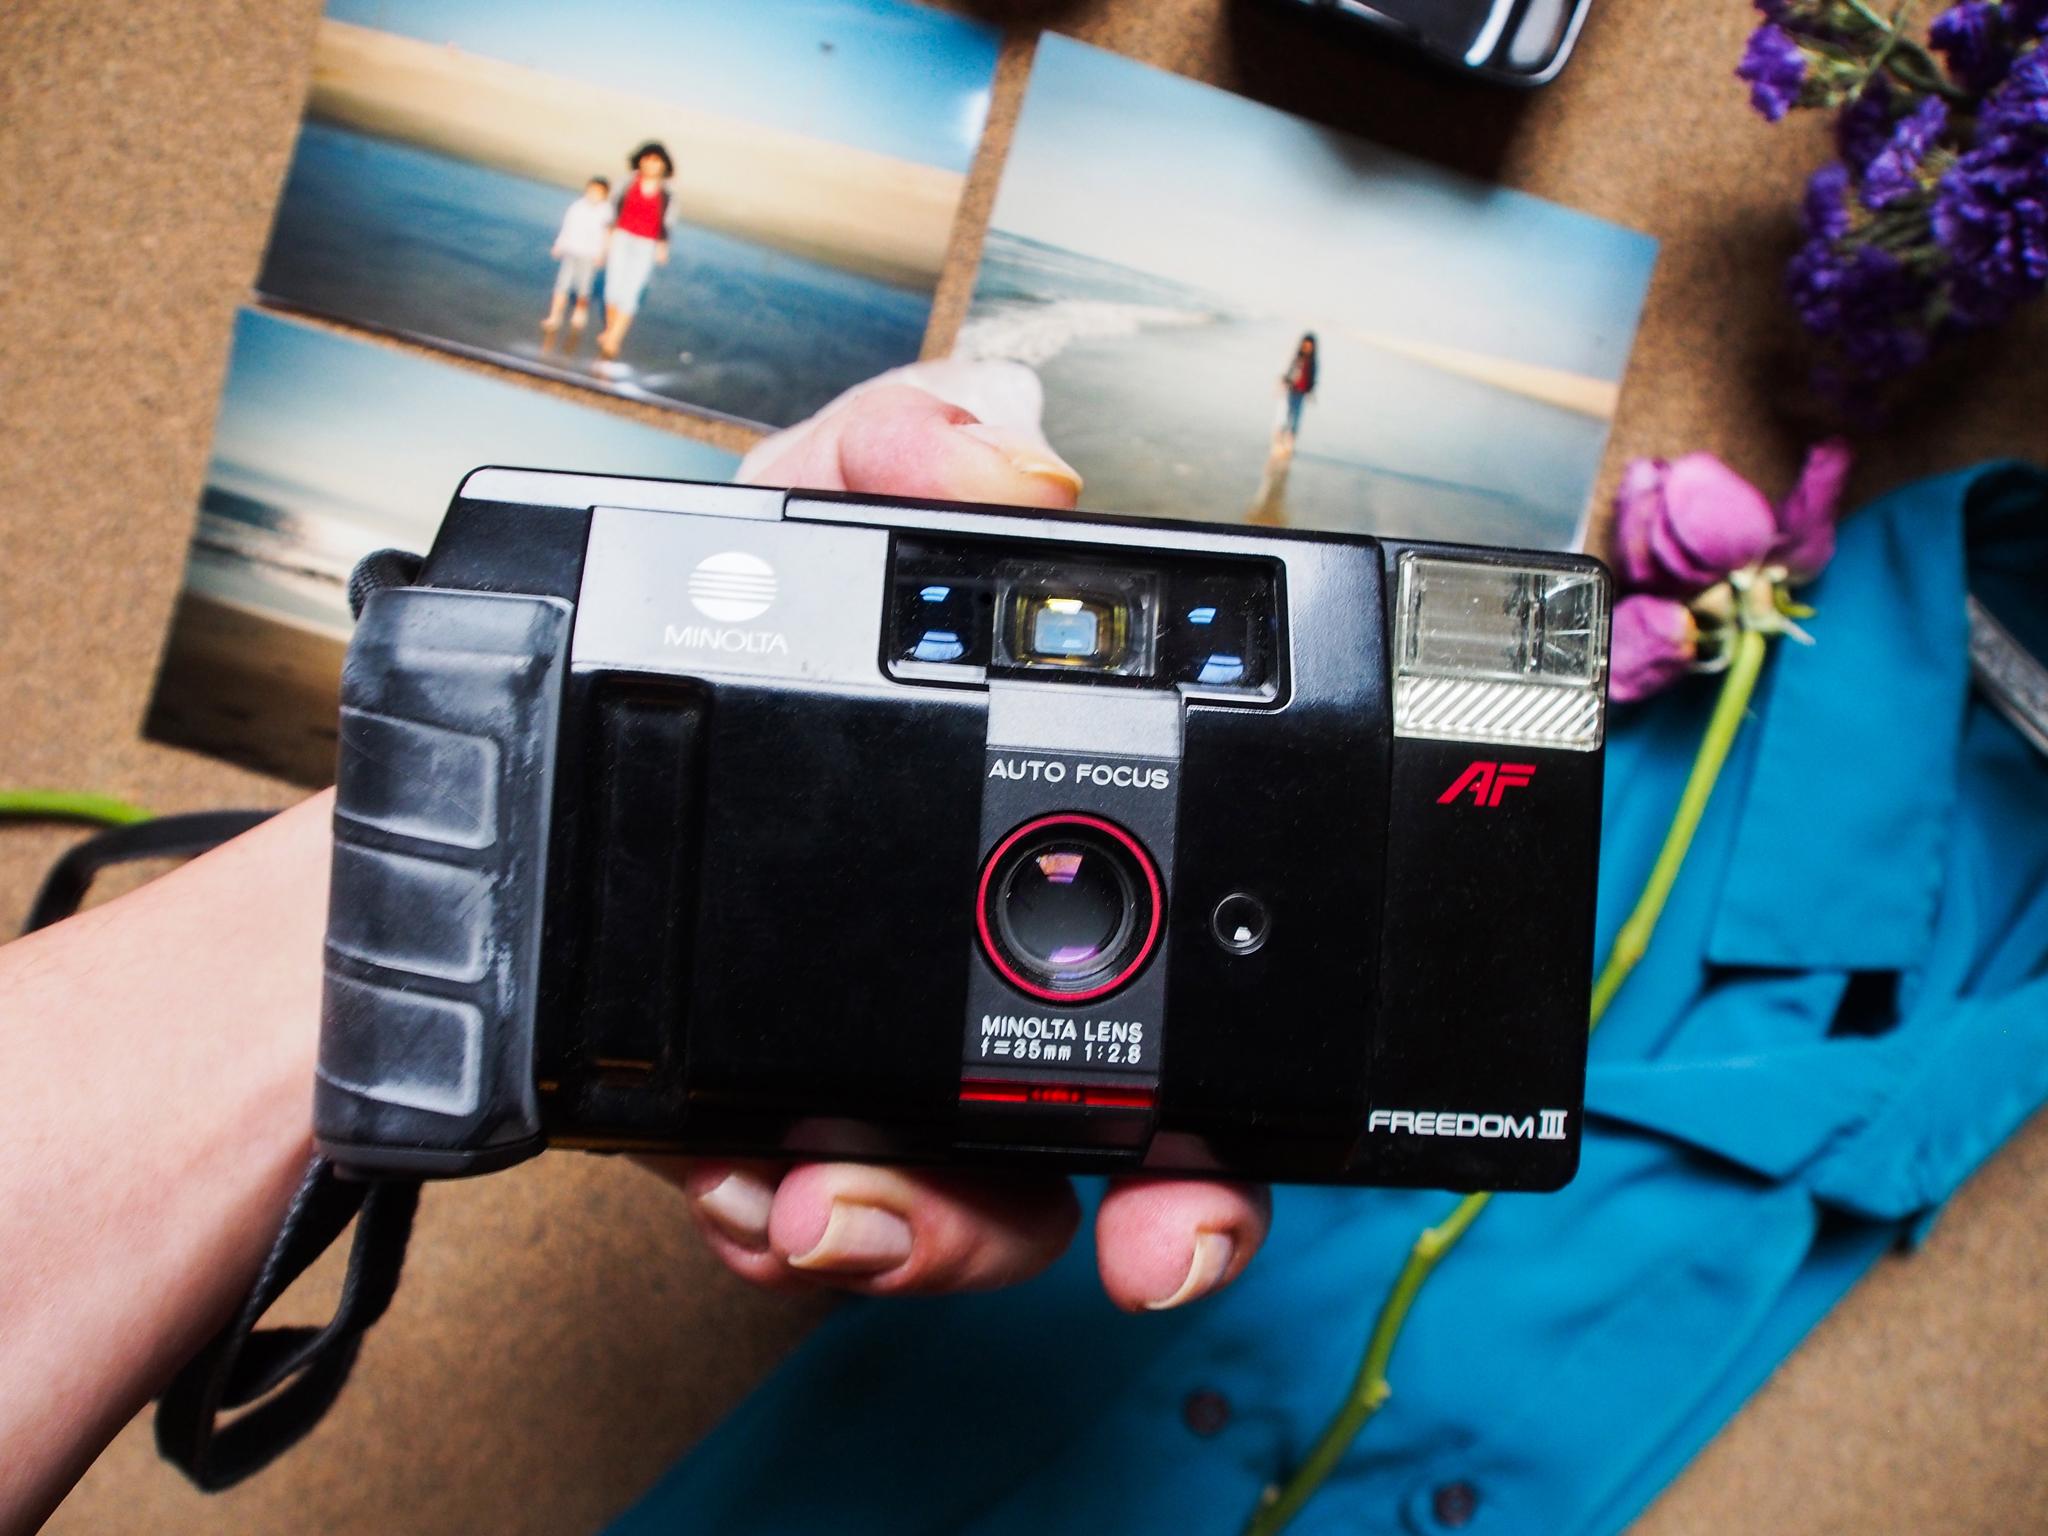 My mother's Freedom III  Minolta  Film Camera 📷.